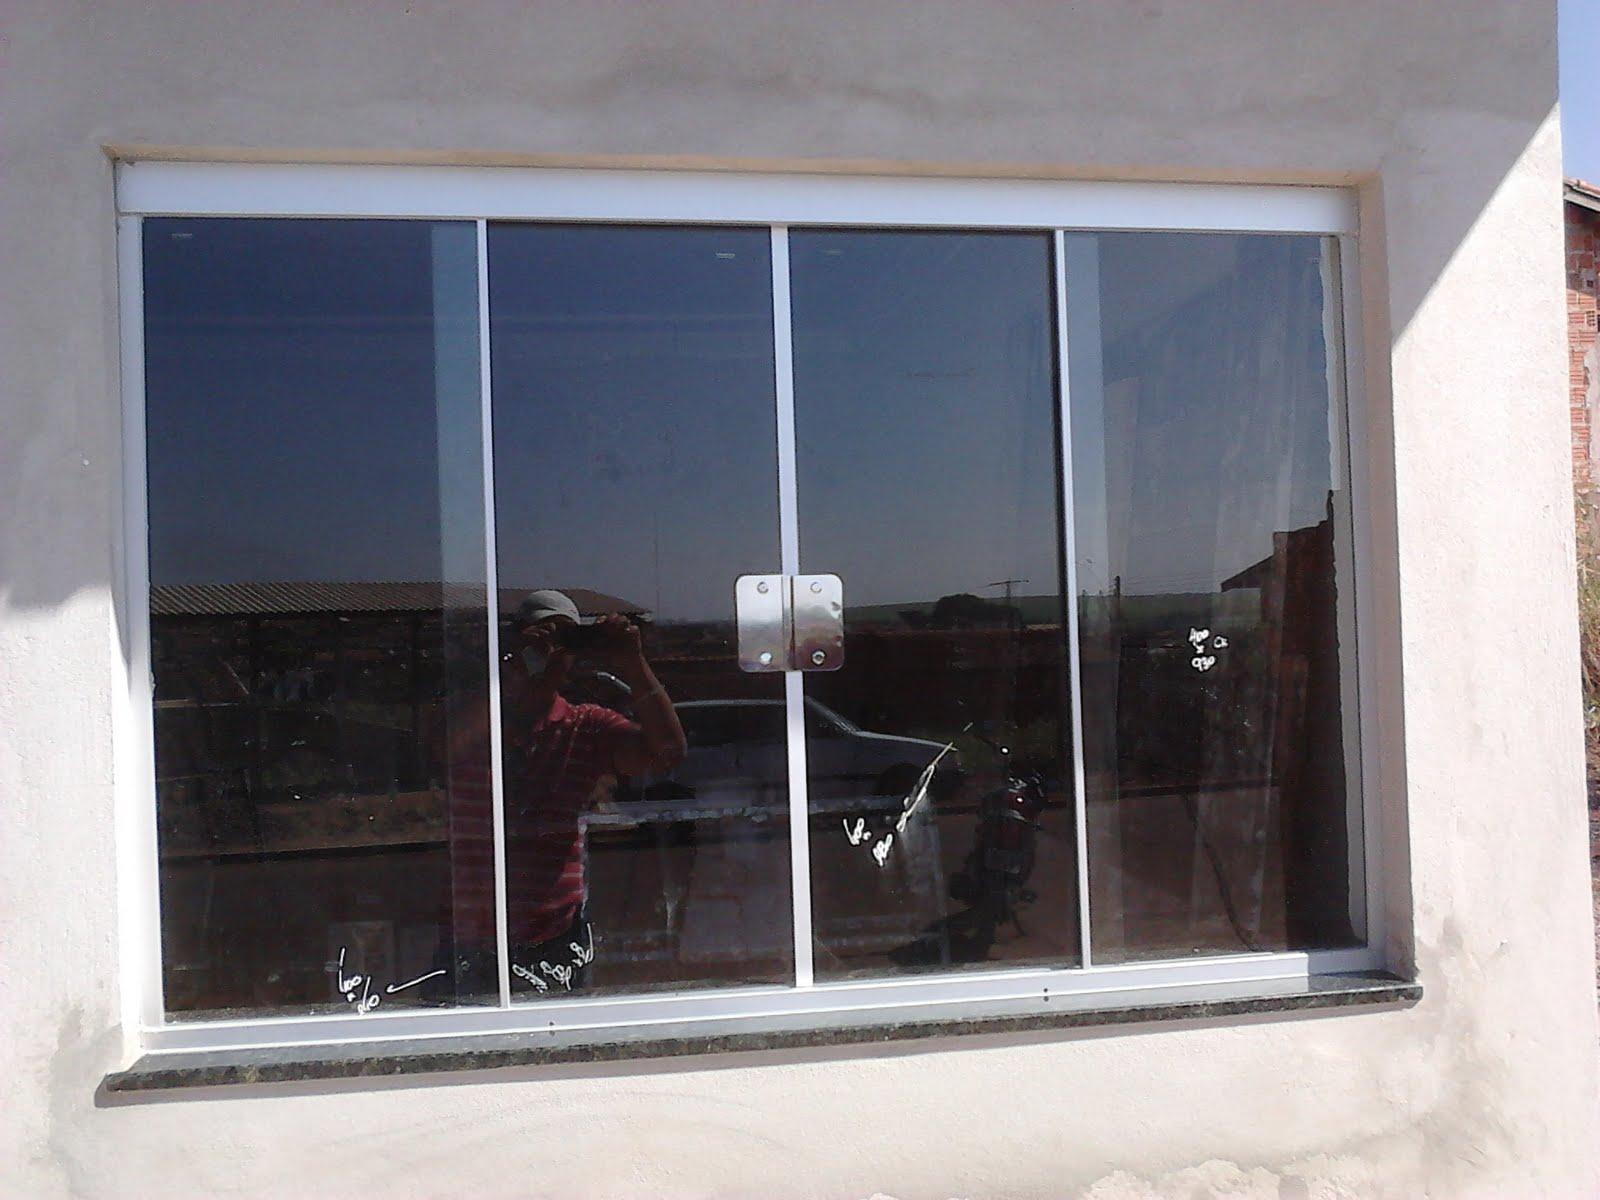 #4A5D81 Janela (1 00 x 1 50) com vidro Incolor 08mm temperado Perfil de  1716 Janela De Aluminio Nao Fecha